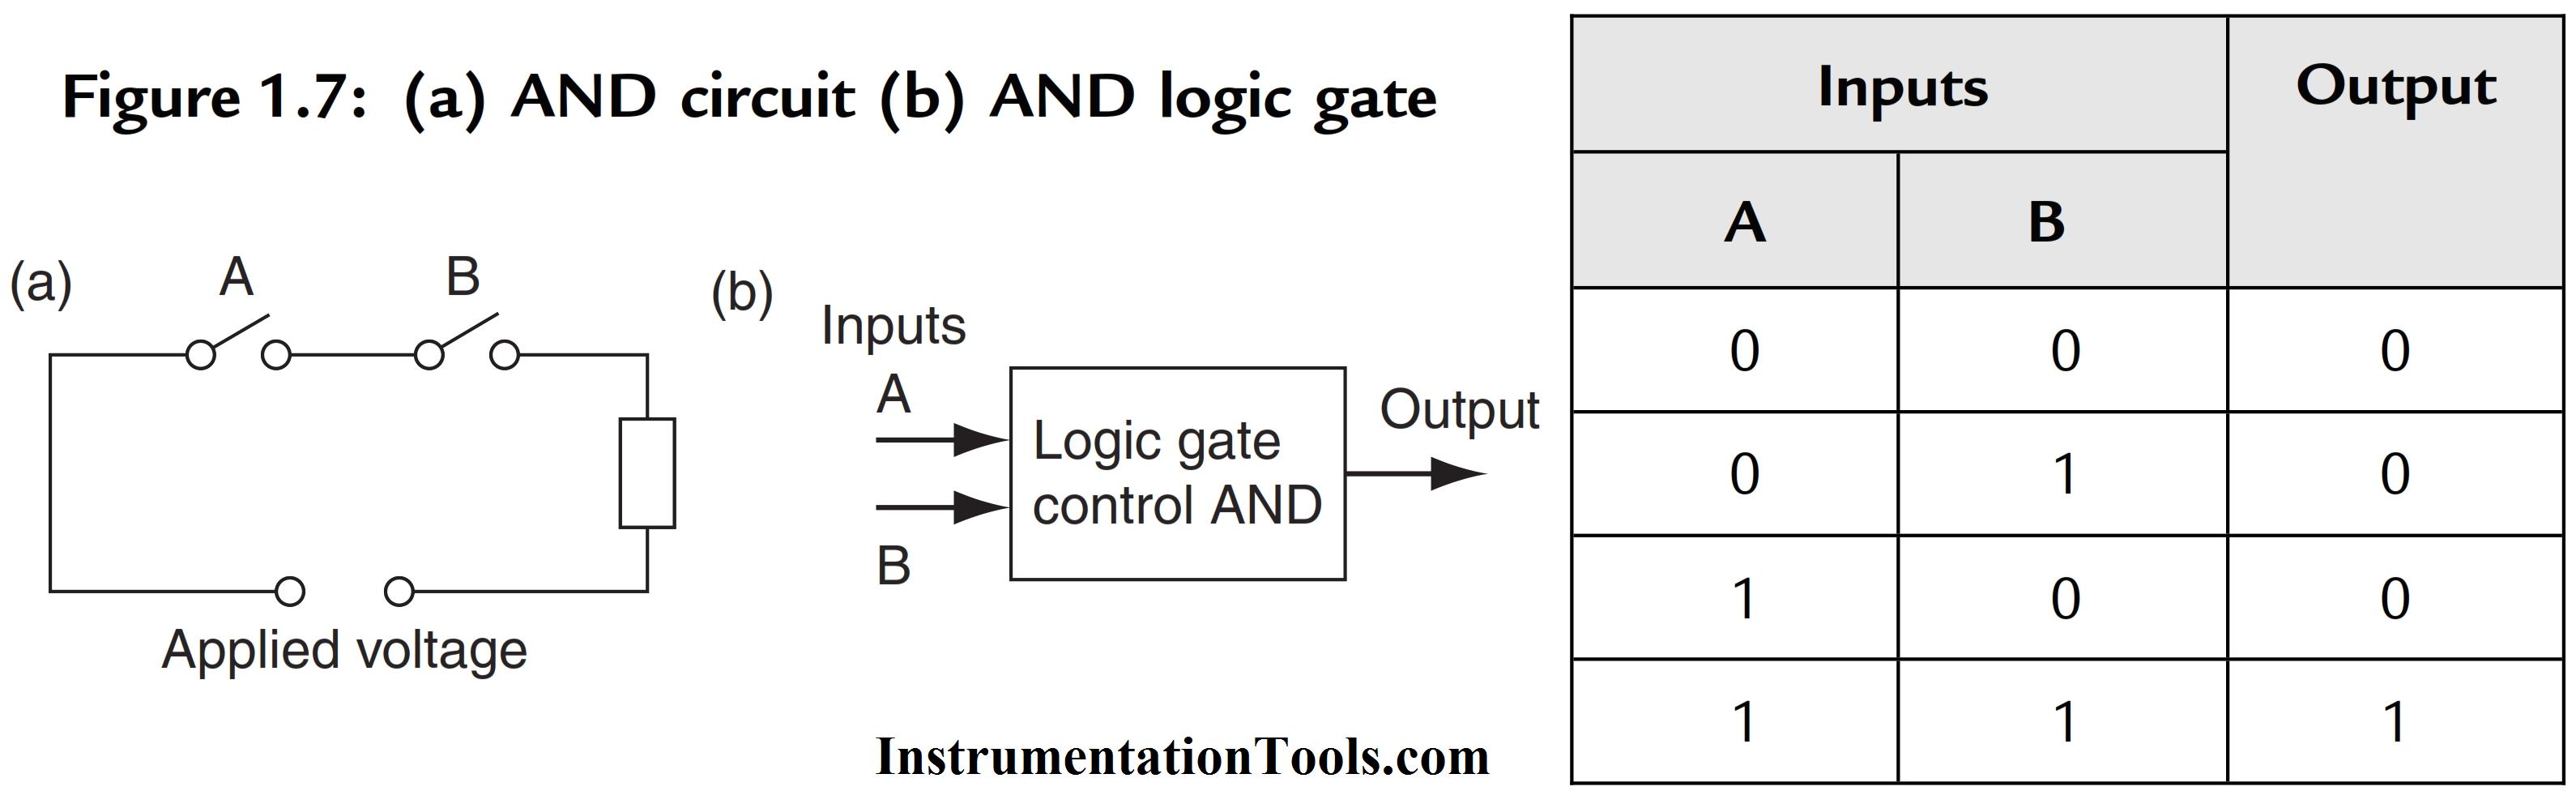 Plc Logic Functions Instrumentation Tools Pinterest Ladder Diagram Nand Gate